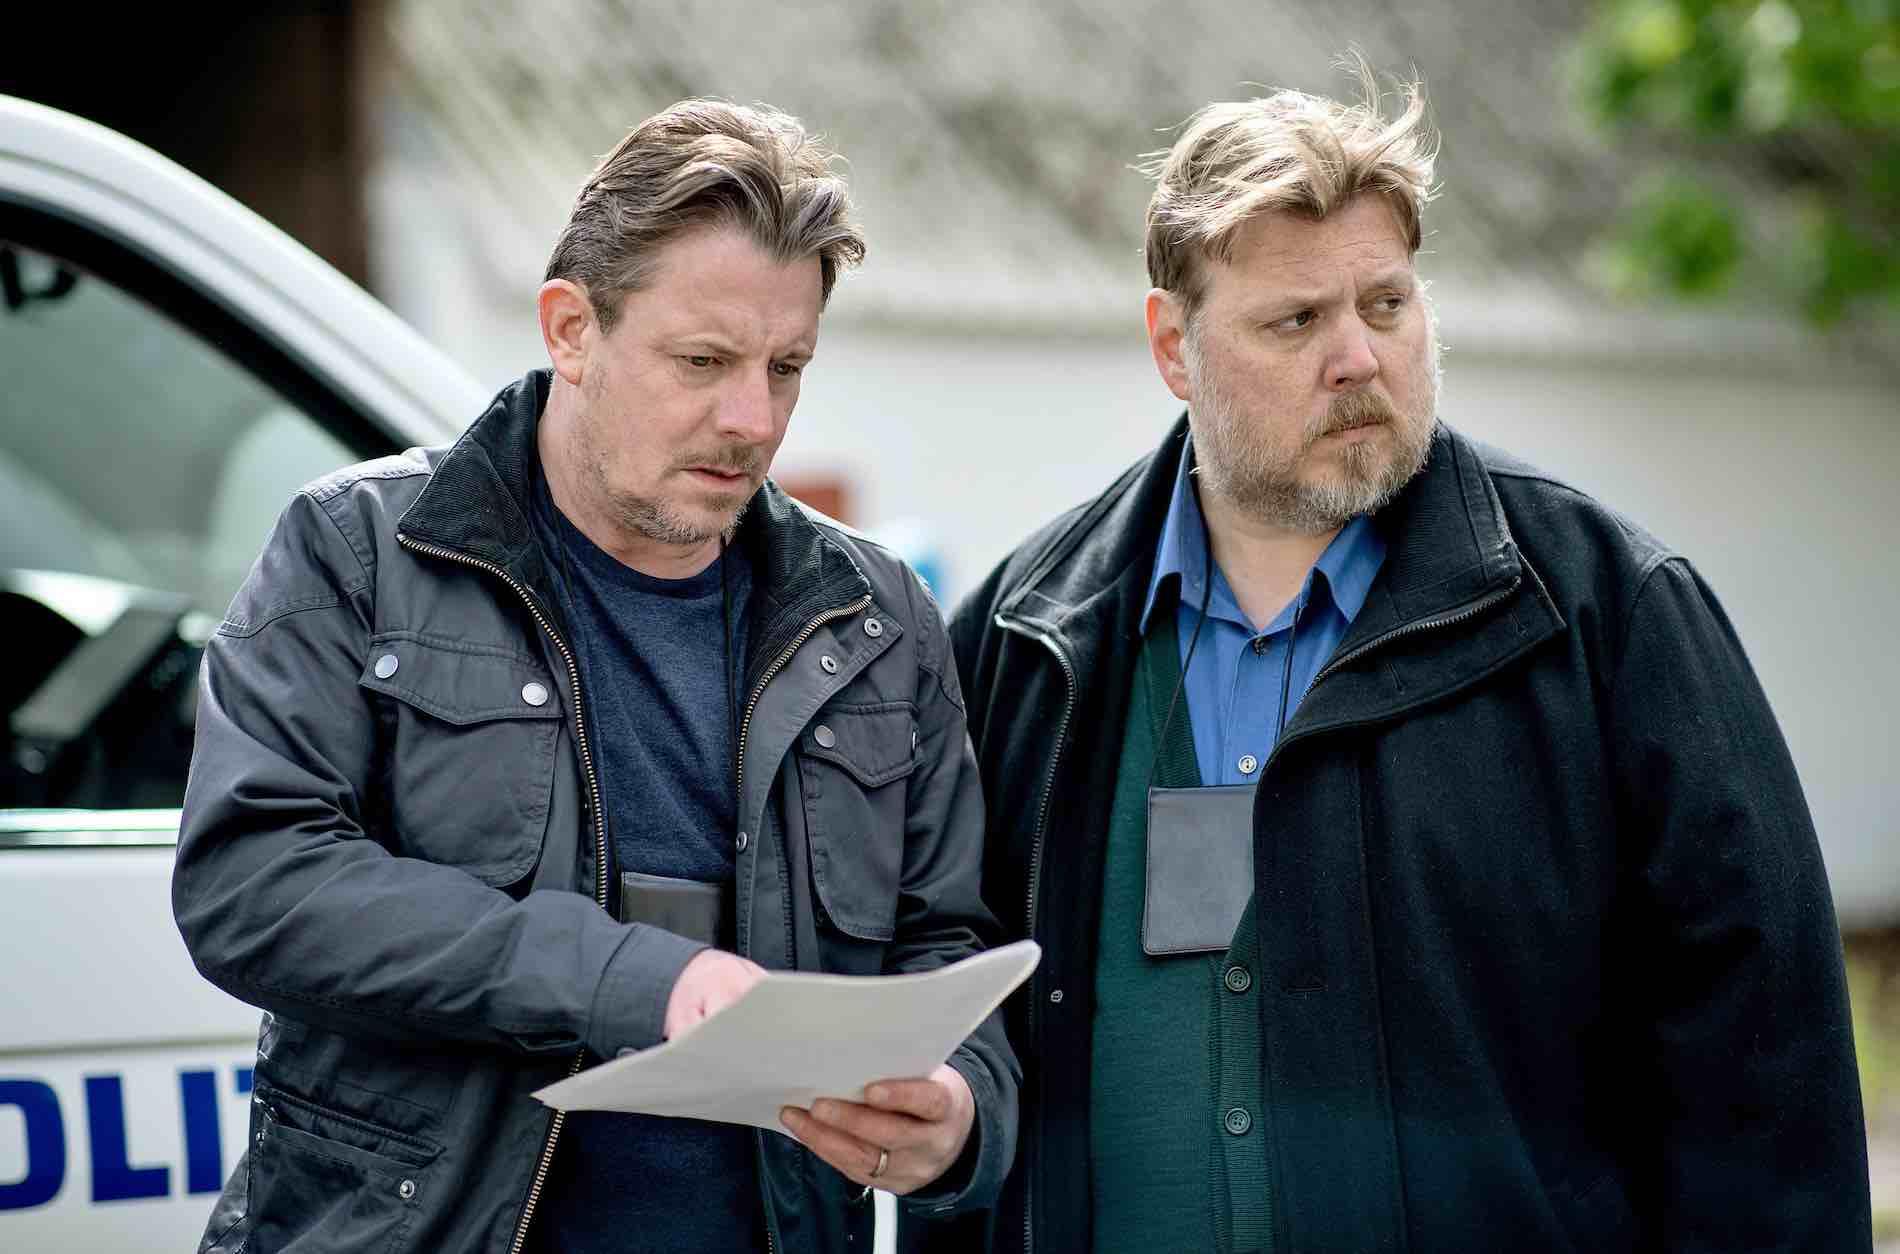 Dänische Serie, Kidnapping, skandinavische Serien, Nordic Noir